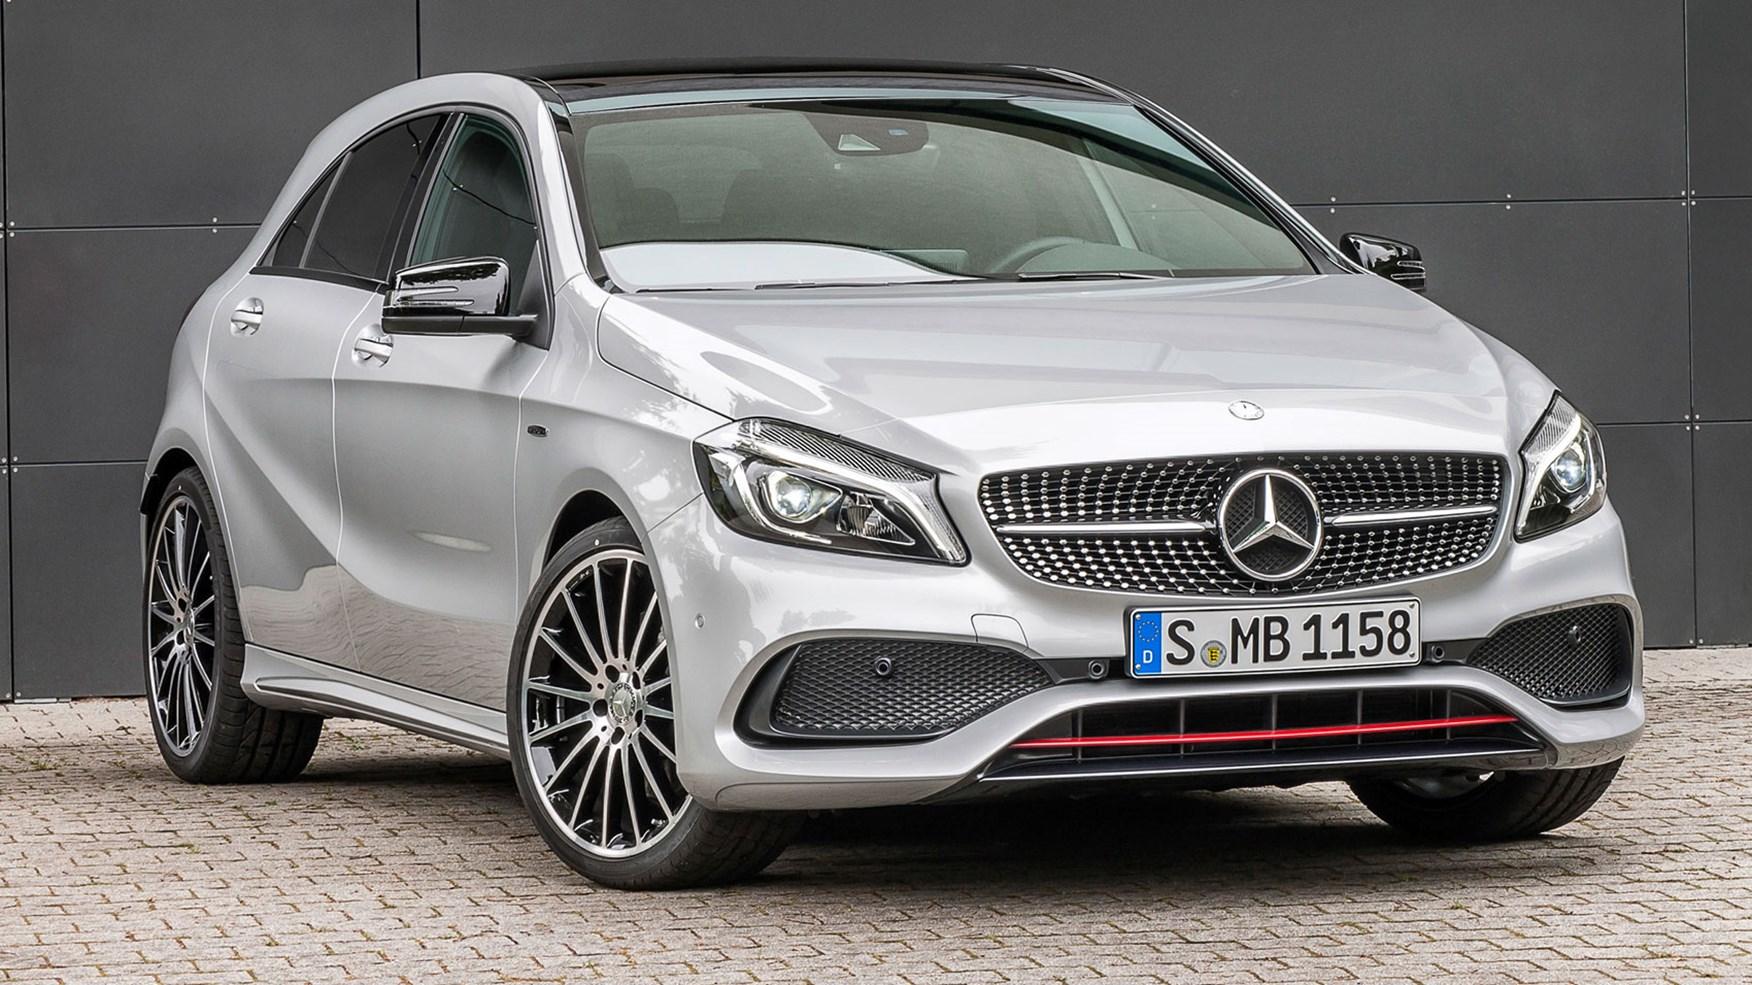 Mercedes Benz Lease Deals 0 Down >> Mercedes-Benz A250 AMG (2015) review by CAR Magazine